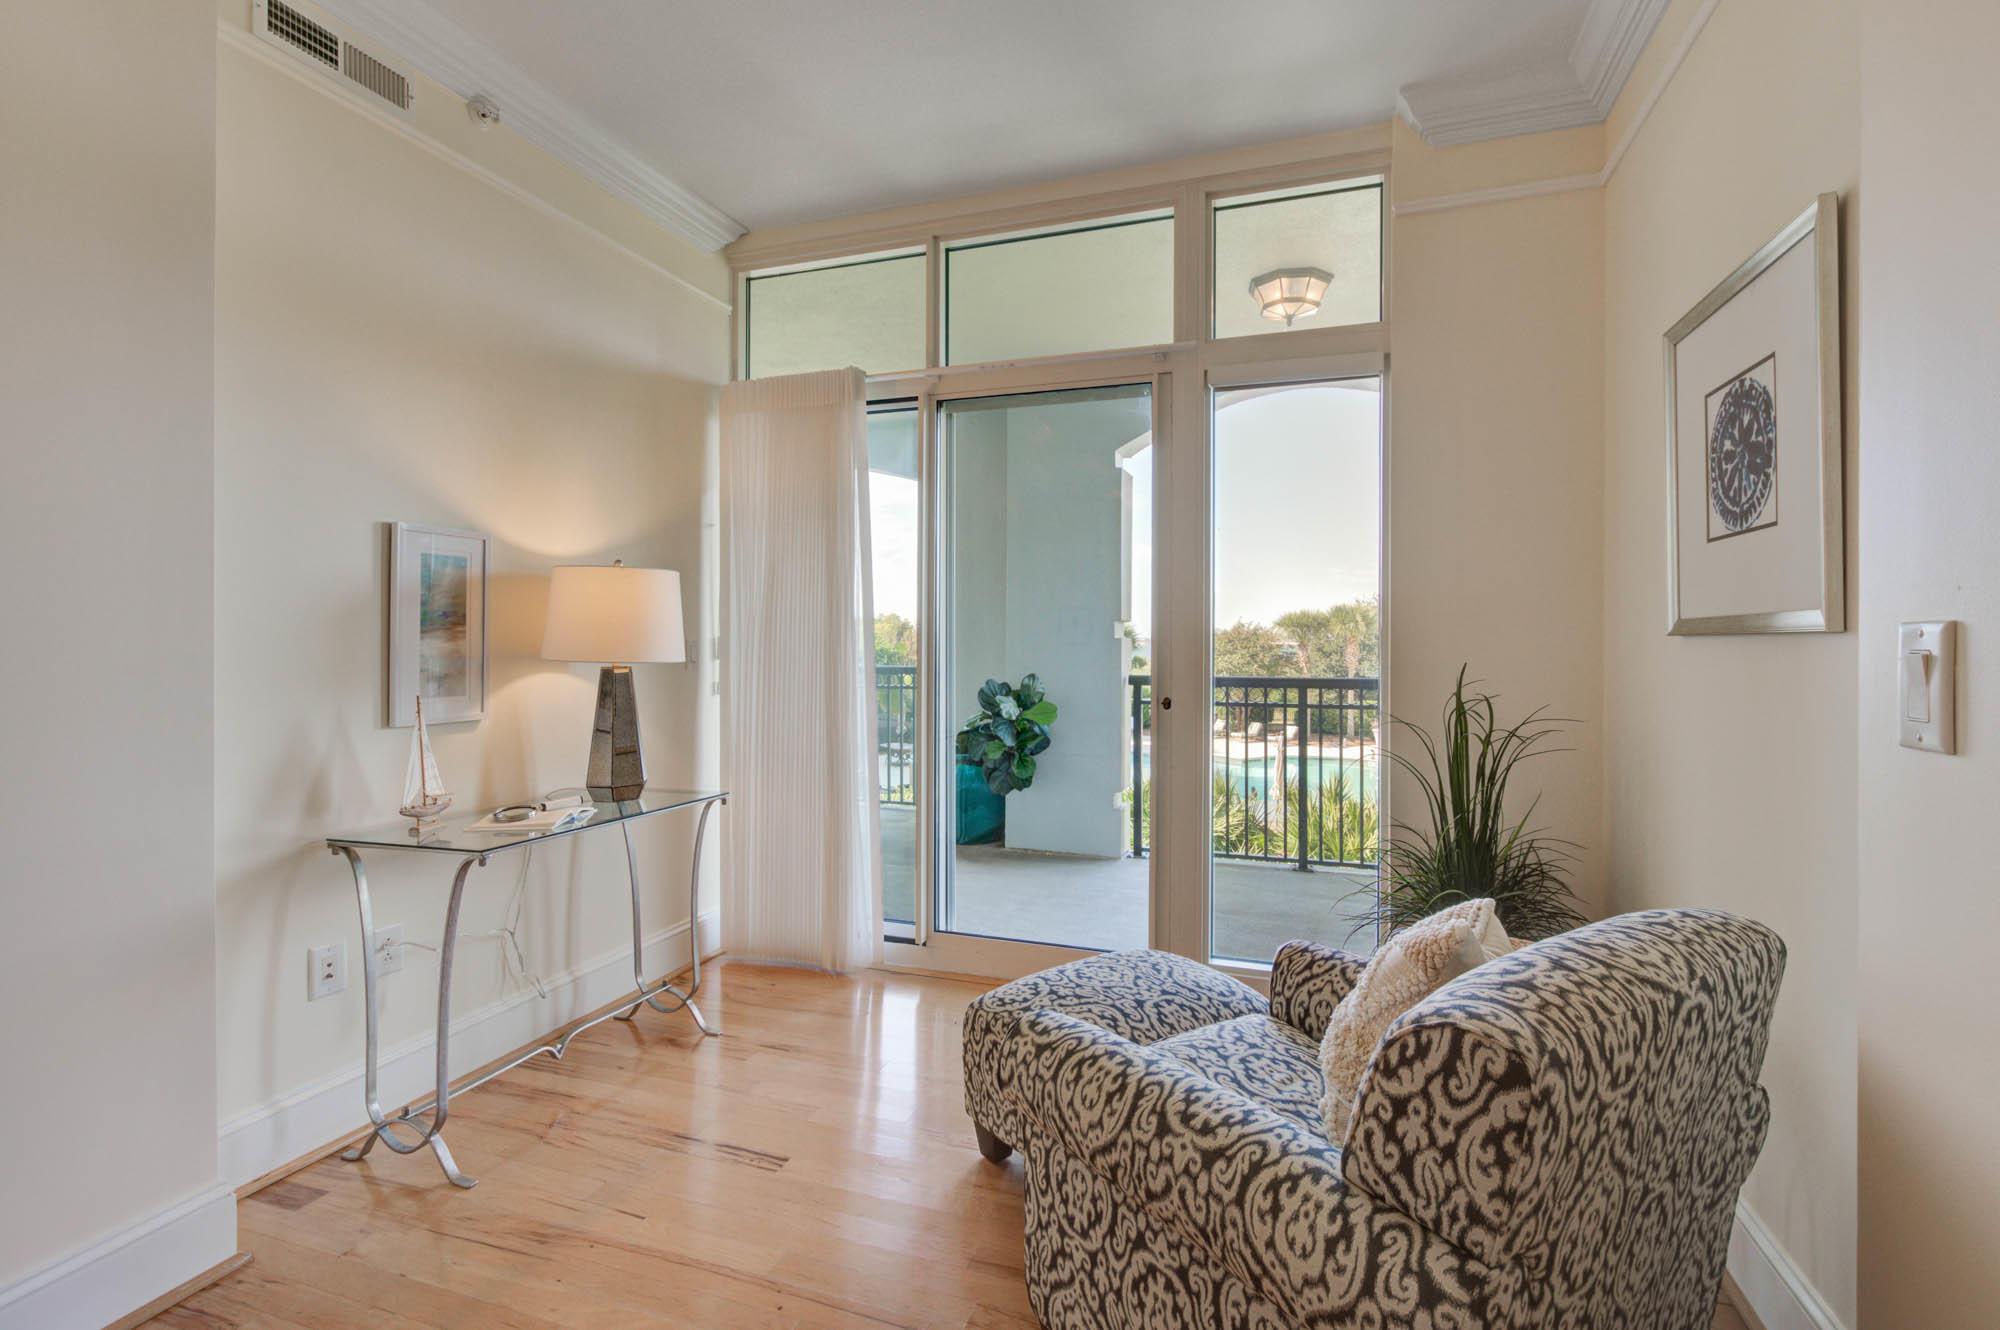 Renaissance On Chas Harbor Homes For Sale - 125 Plaza, Mount Pleasant, SC - 35